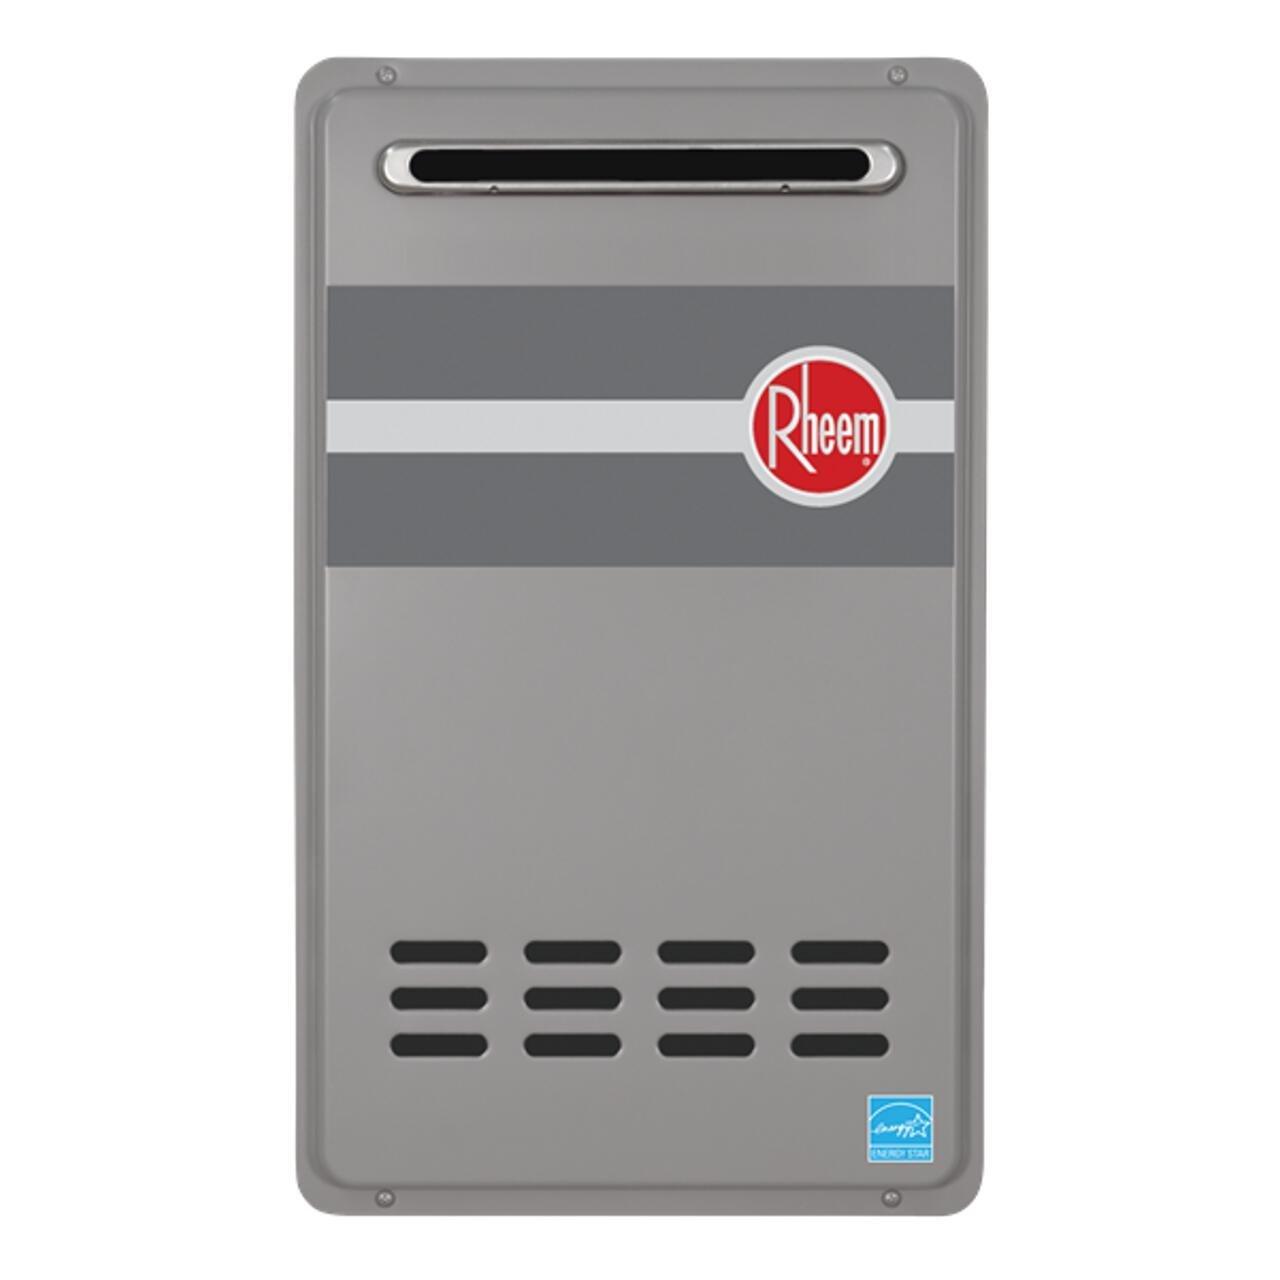 Rheem RTG-84XLN Natural Gas Water Heater